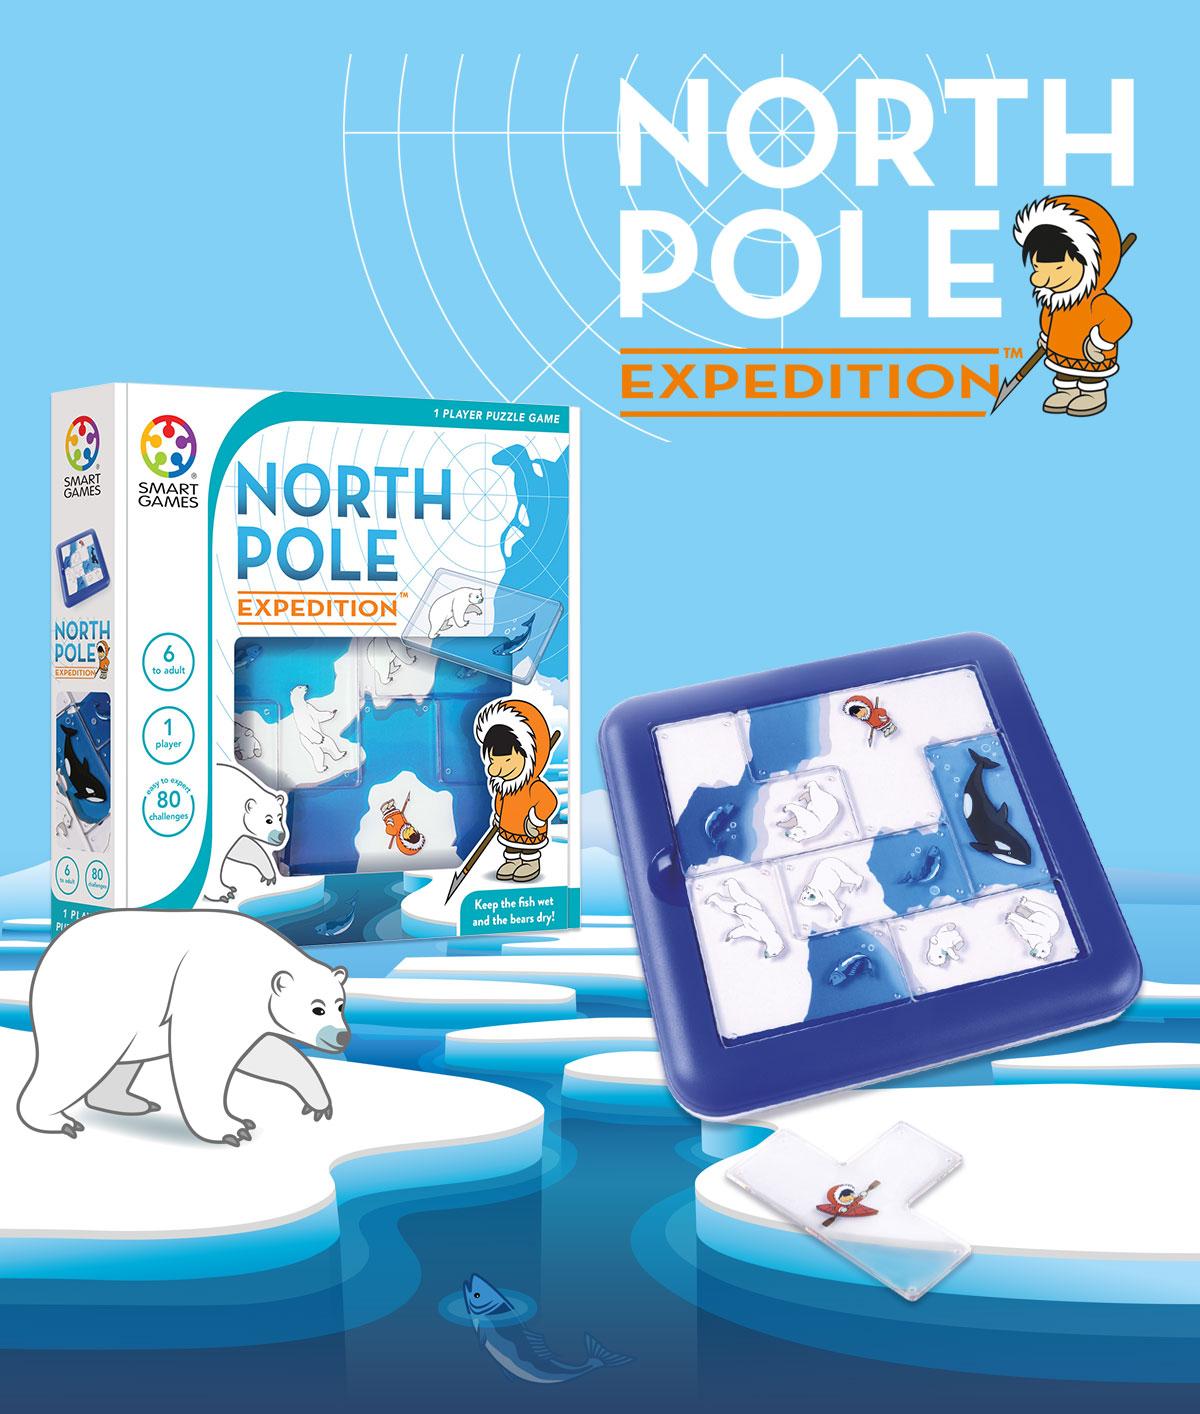 North Pole Expedition Smartgames